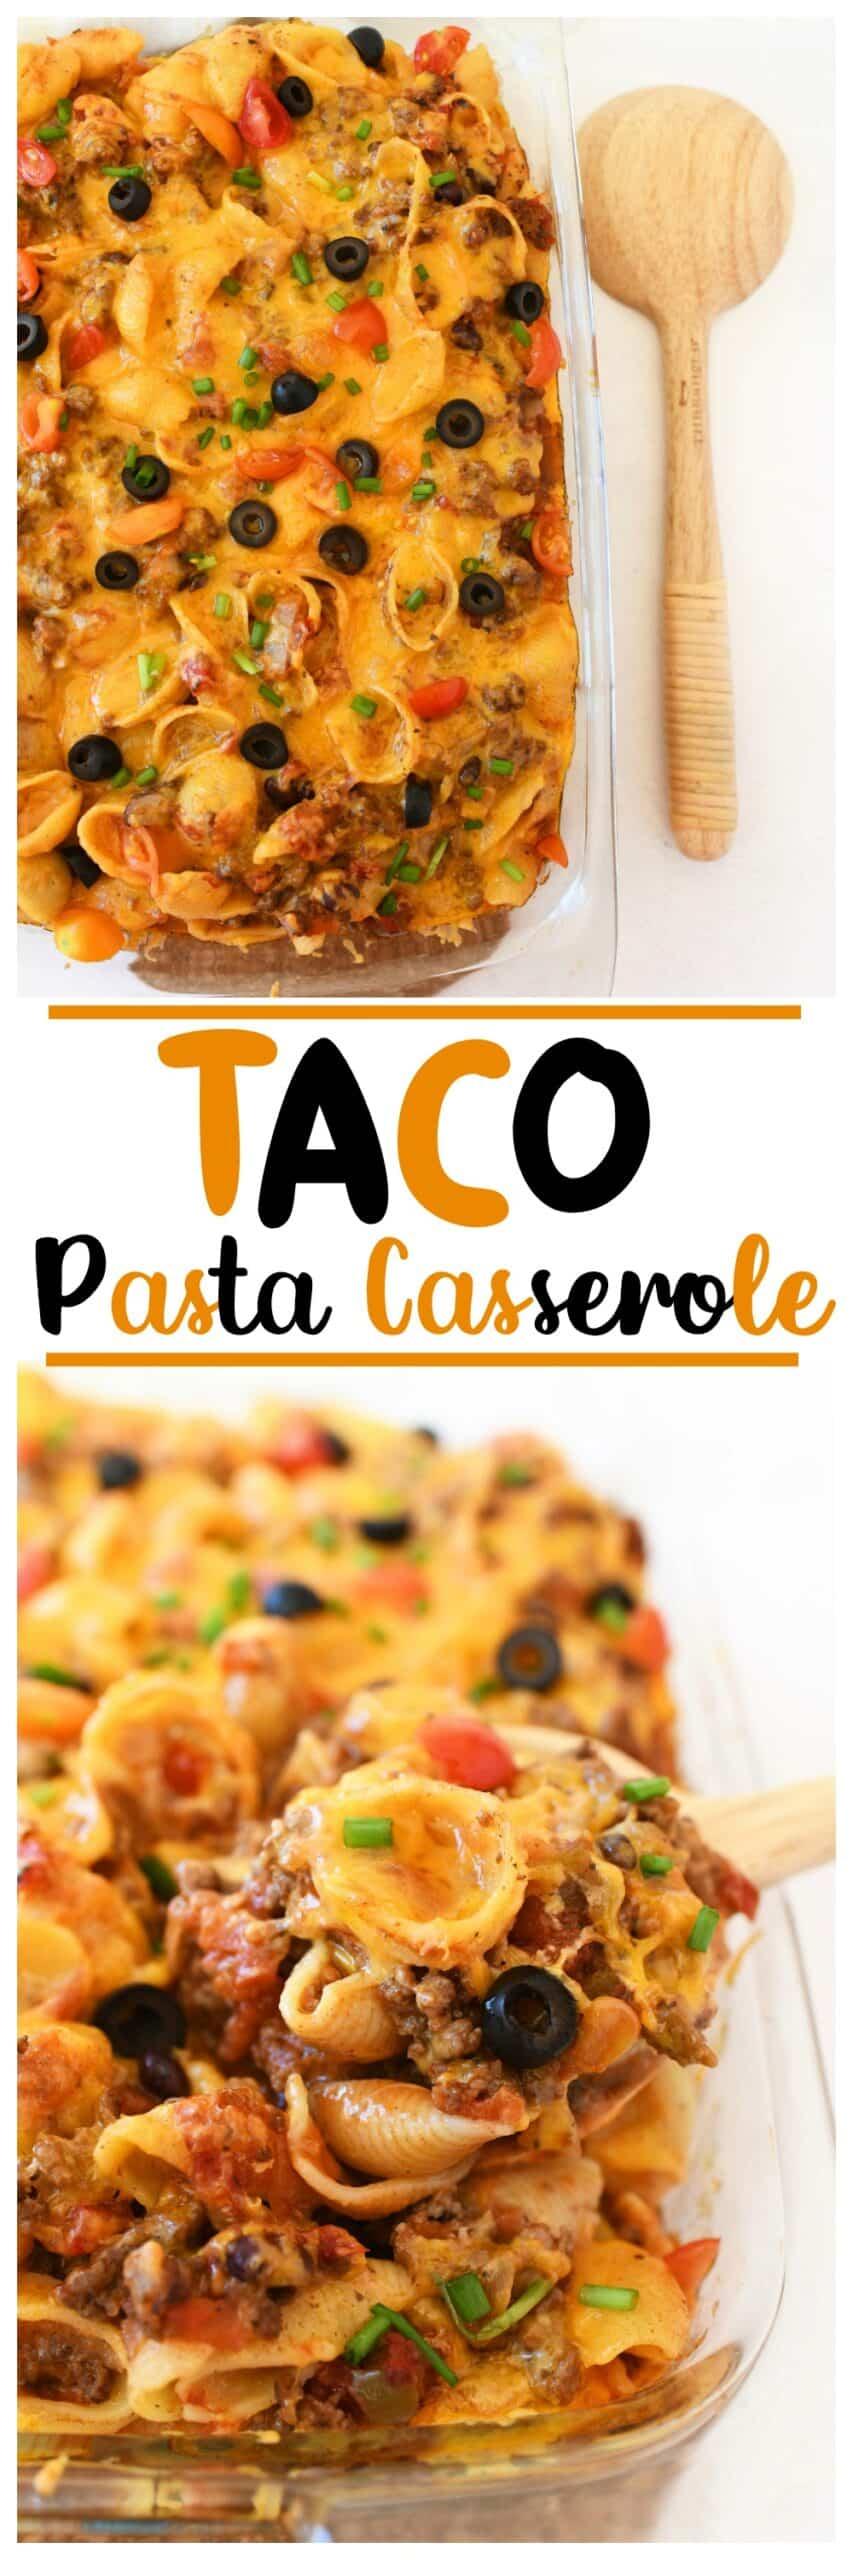 Cheesy Taco Pasta Casserole